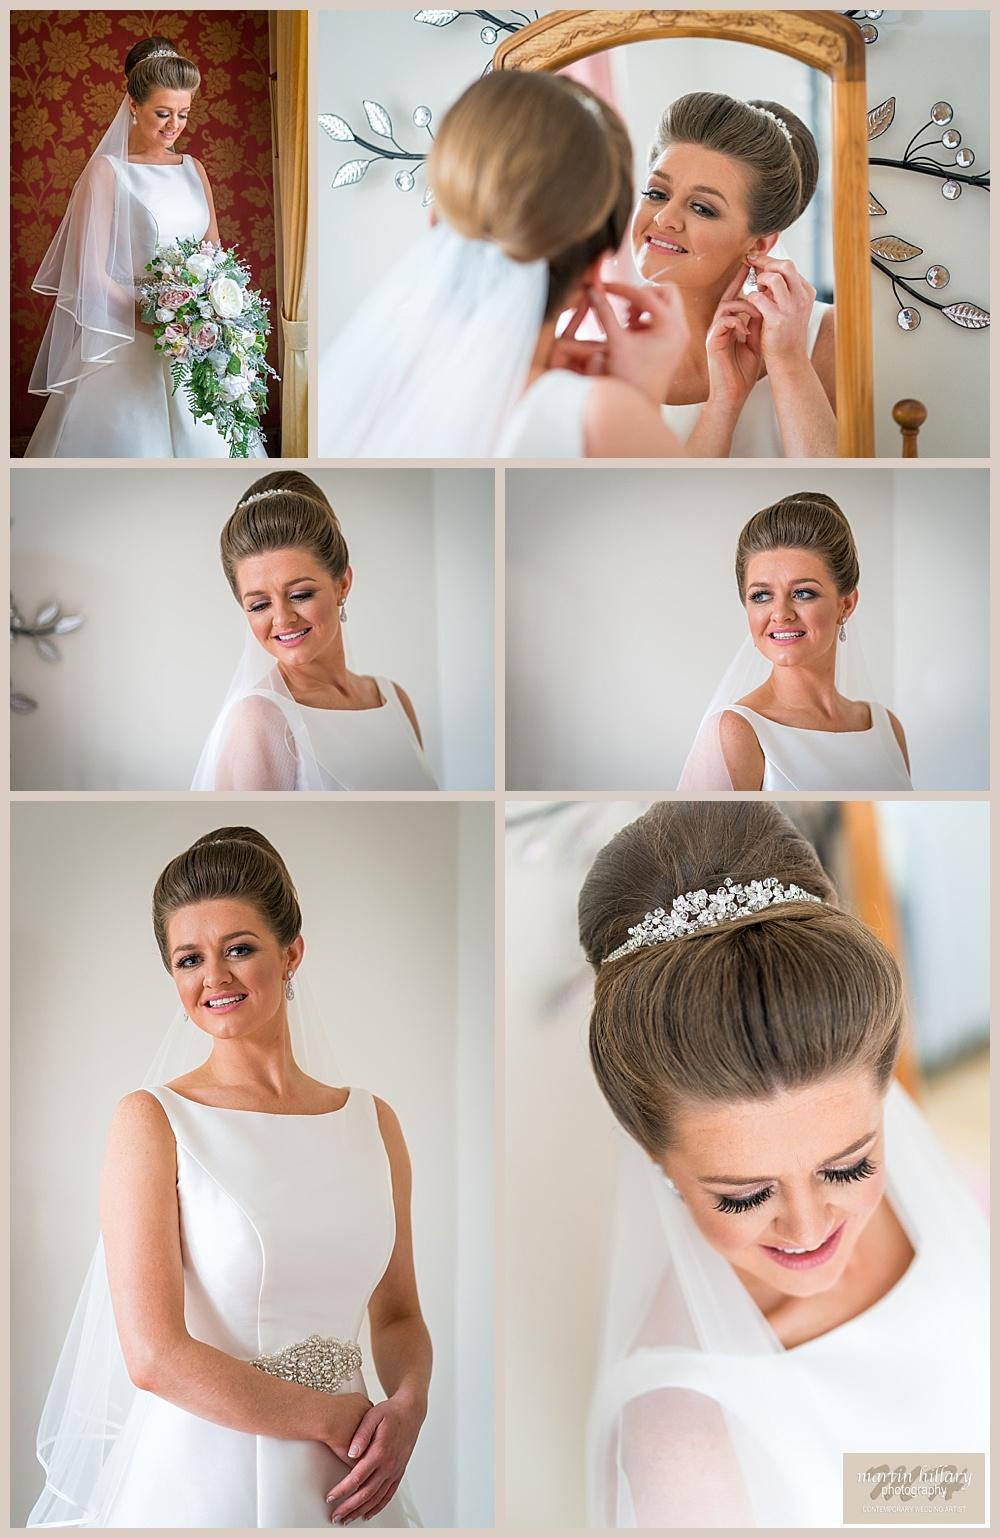 Wentbridge House Wedding Photographer - Bridal Preps and Bridal Portraits